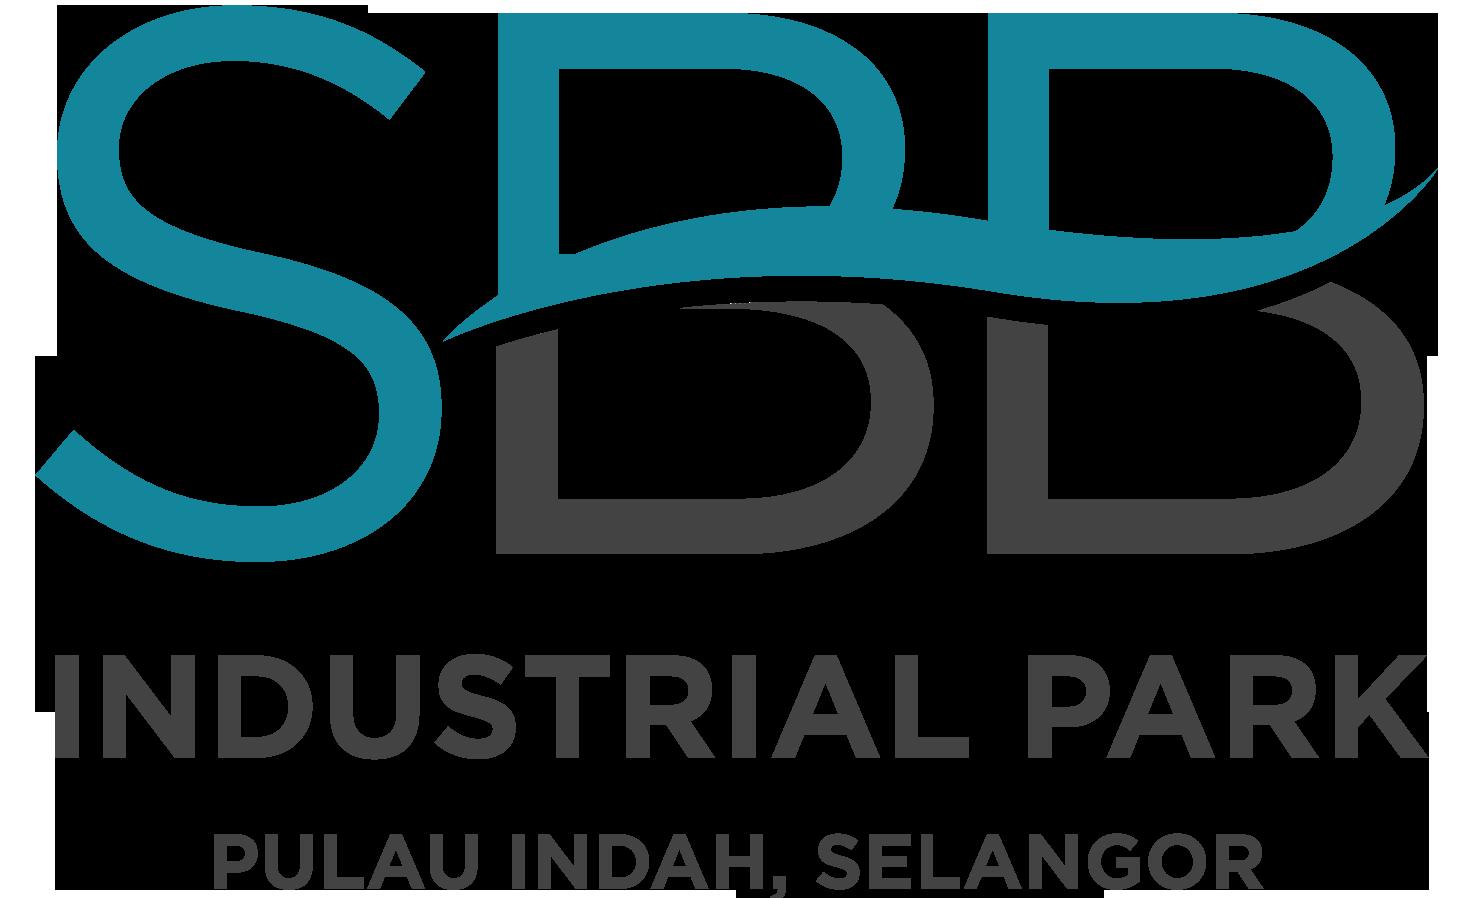 SBB Industrial Park